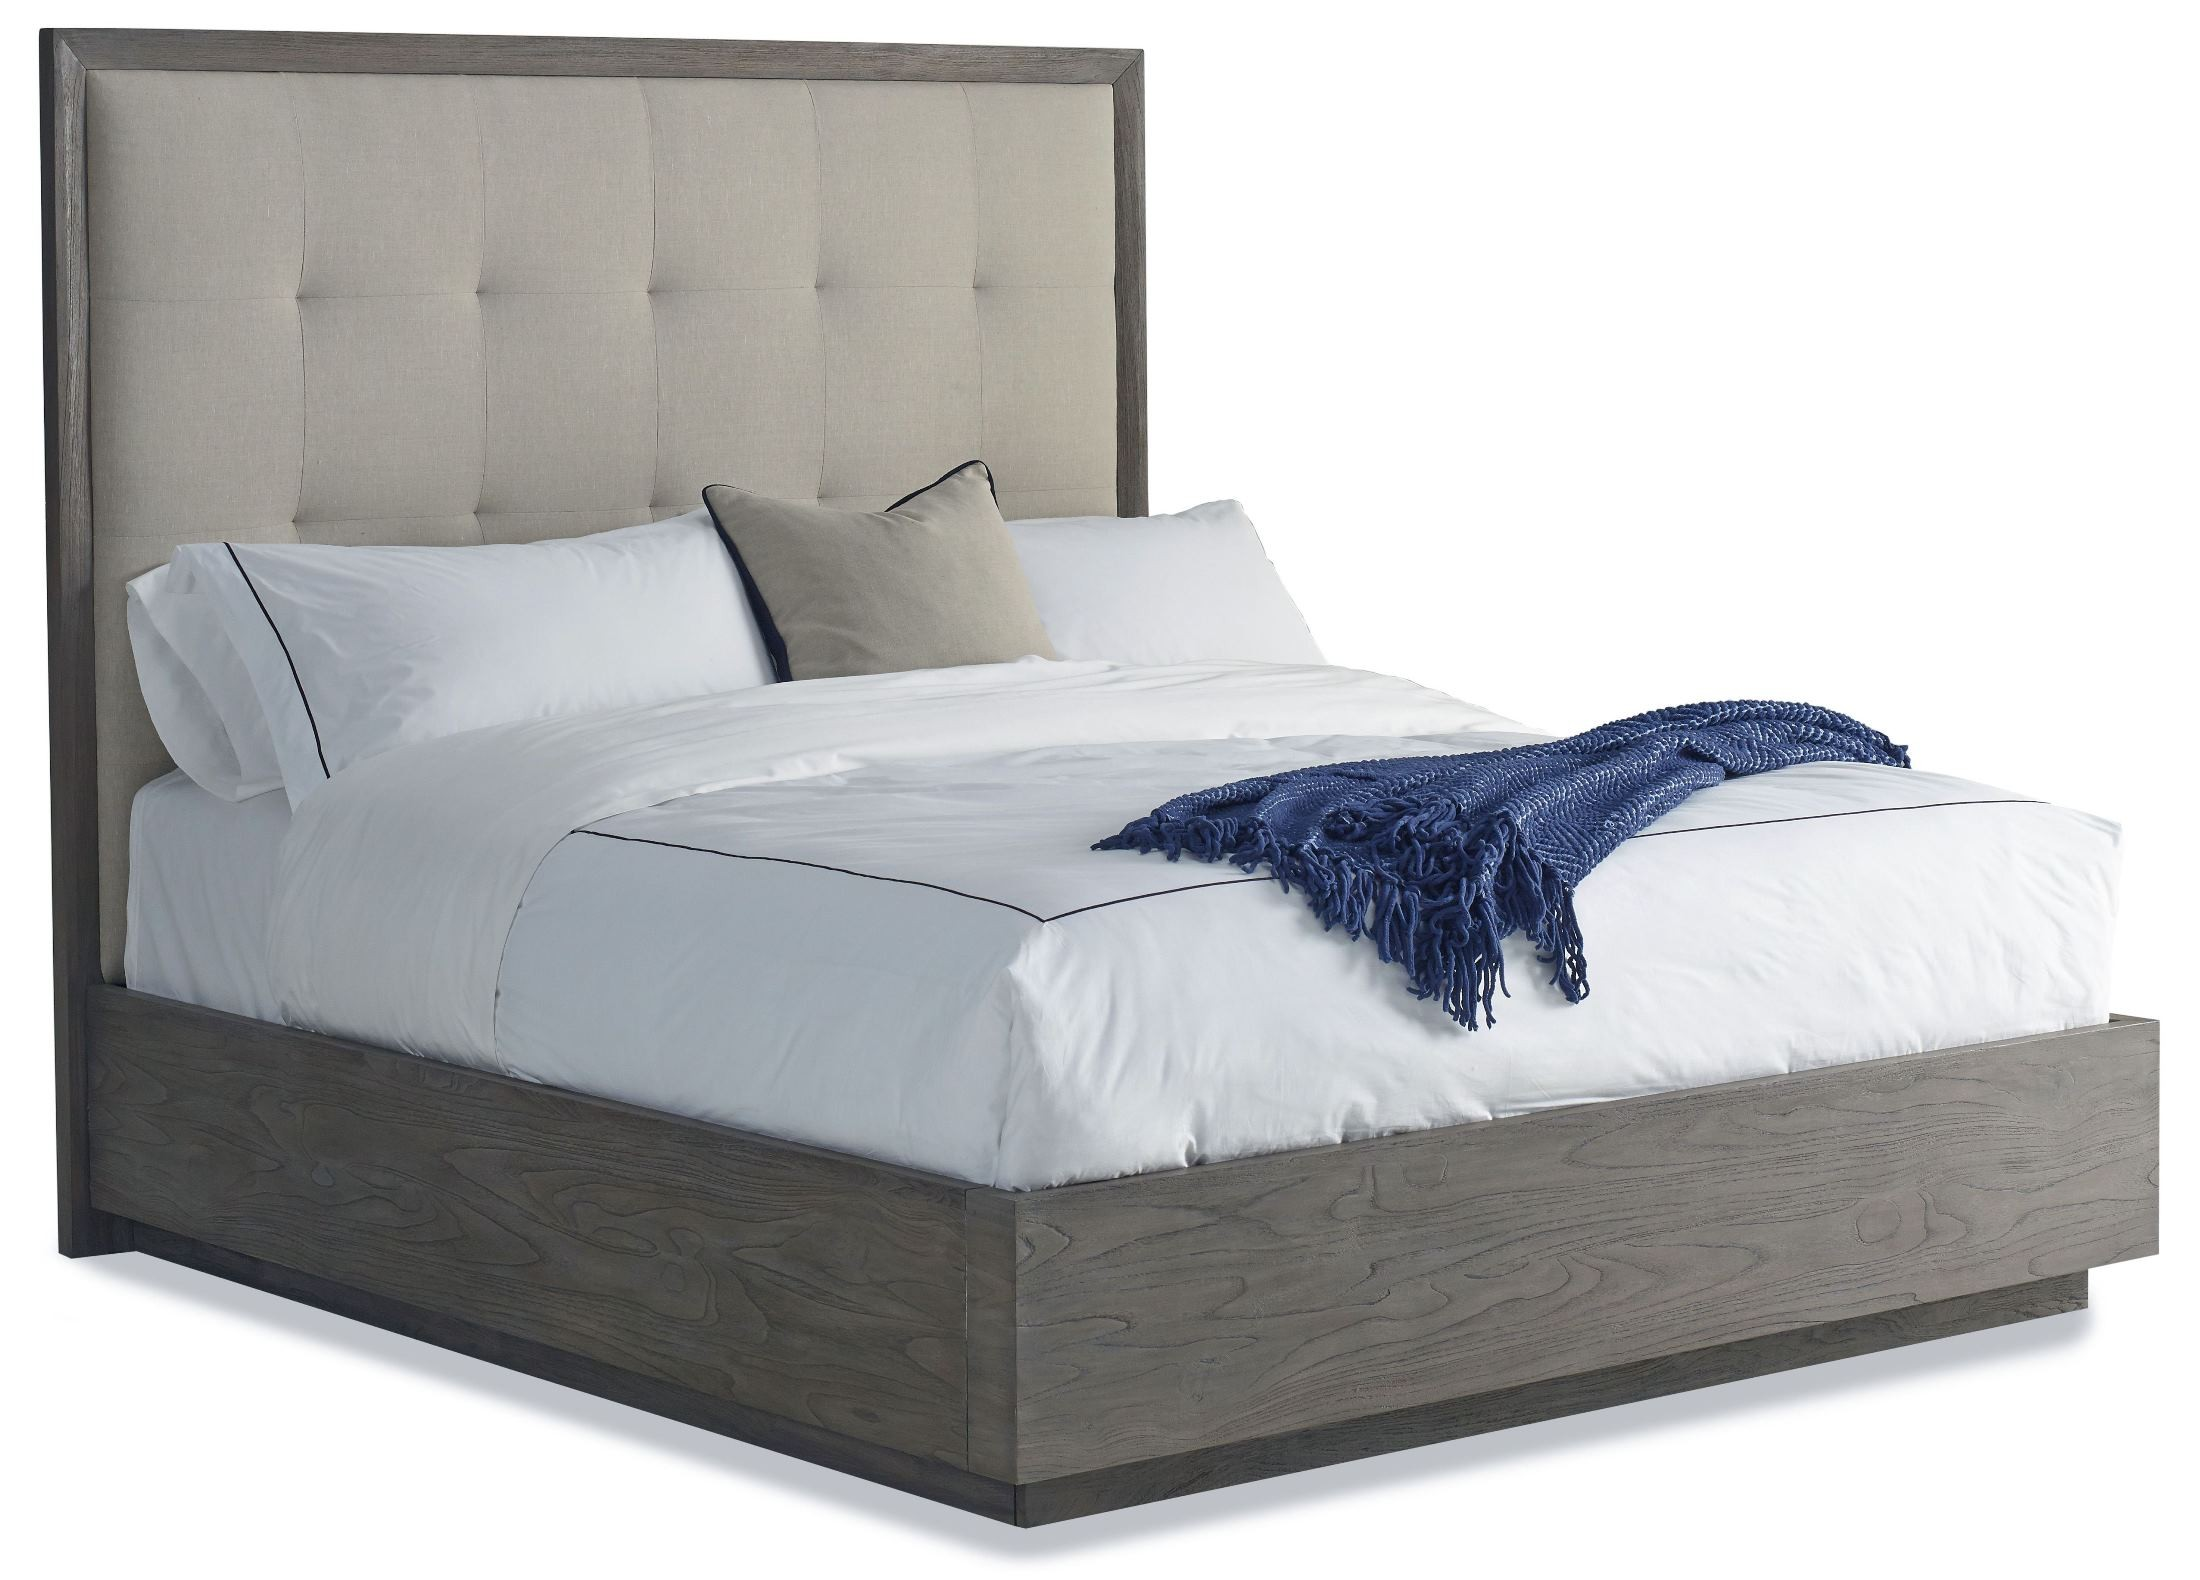 Palmer Queen Upholstered Platform Bed from Brownstone (PL117 ...